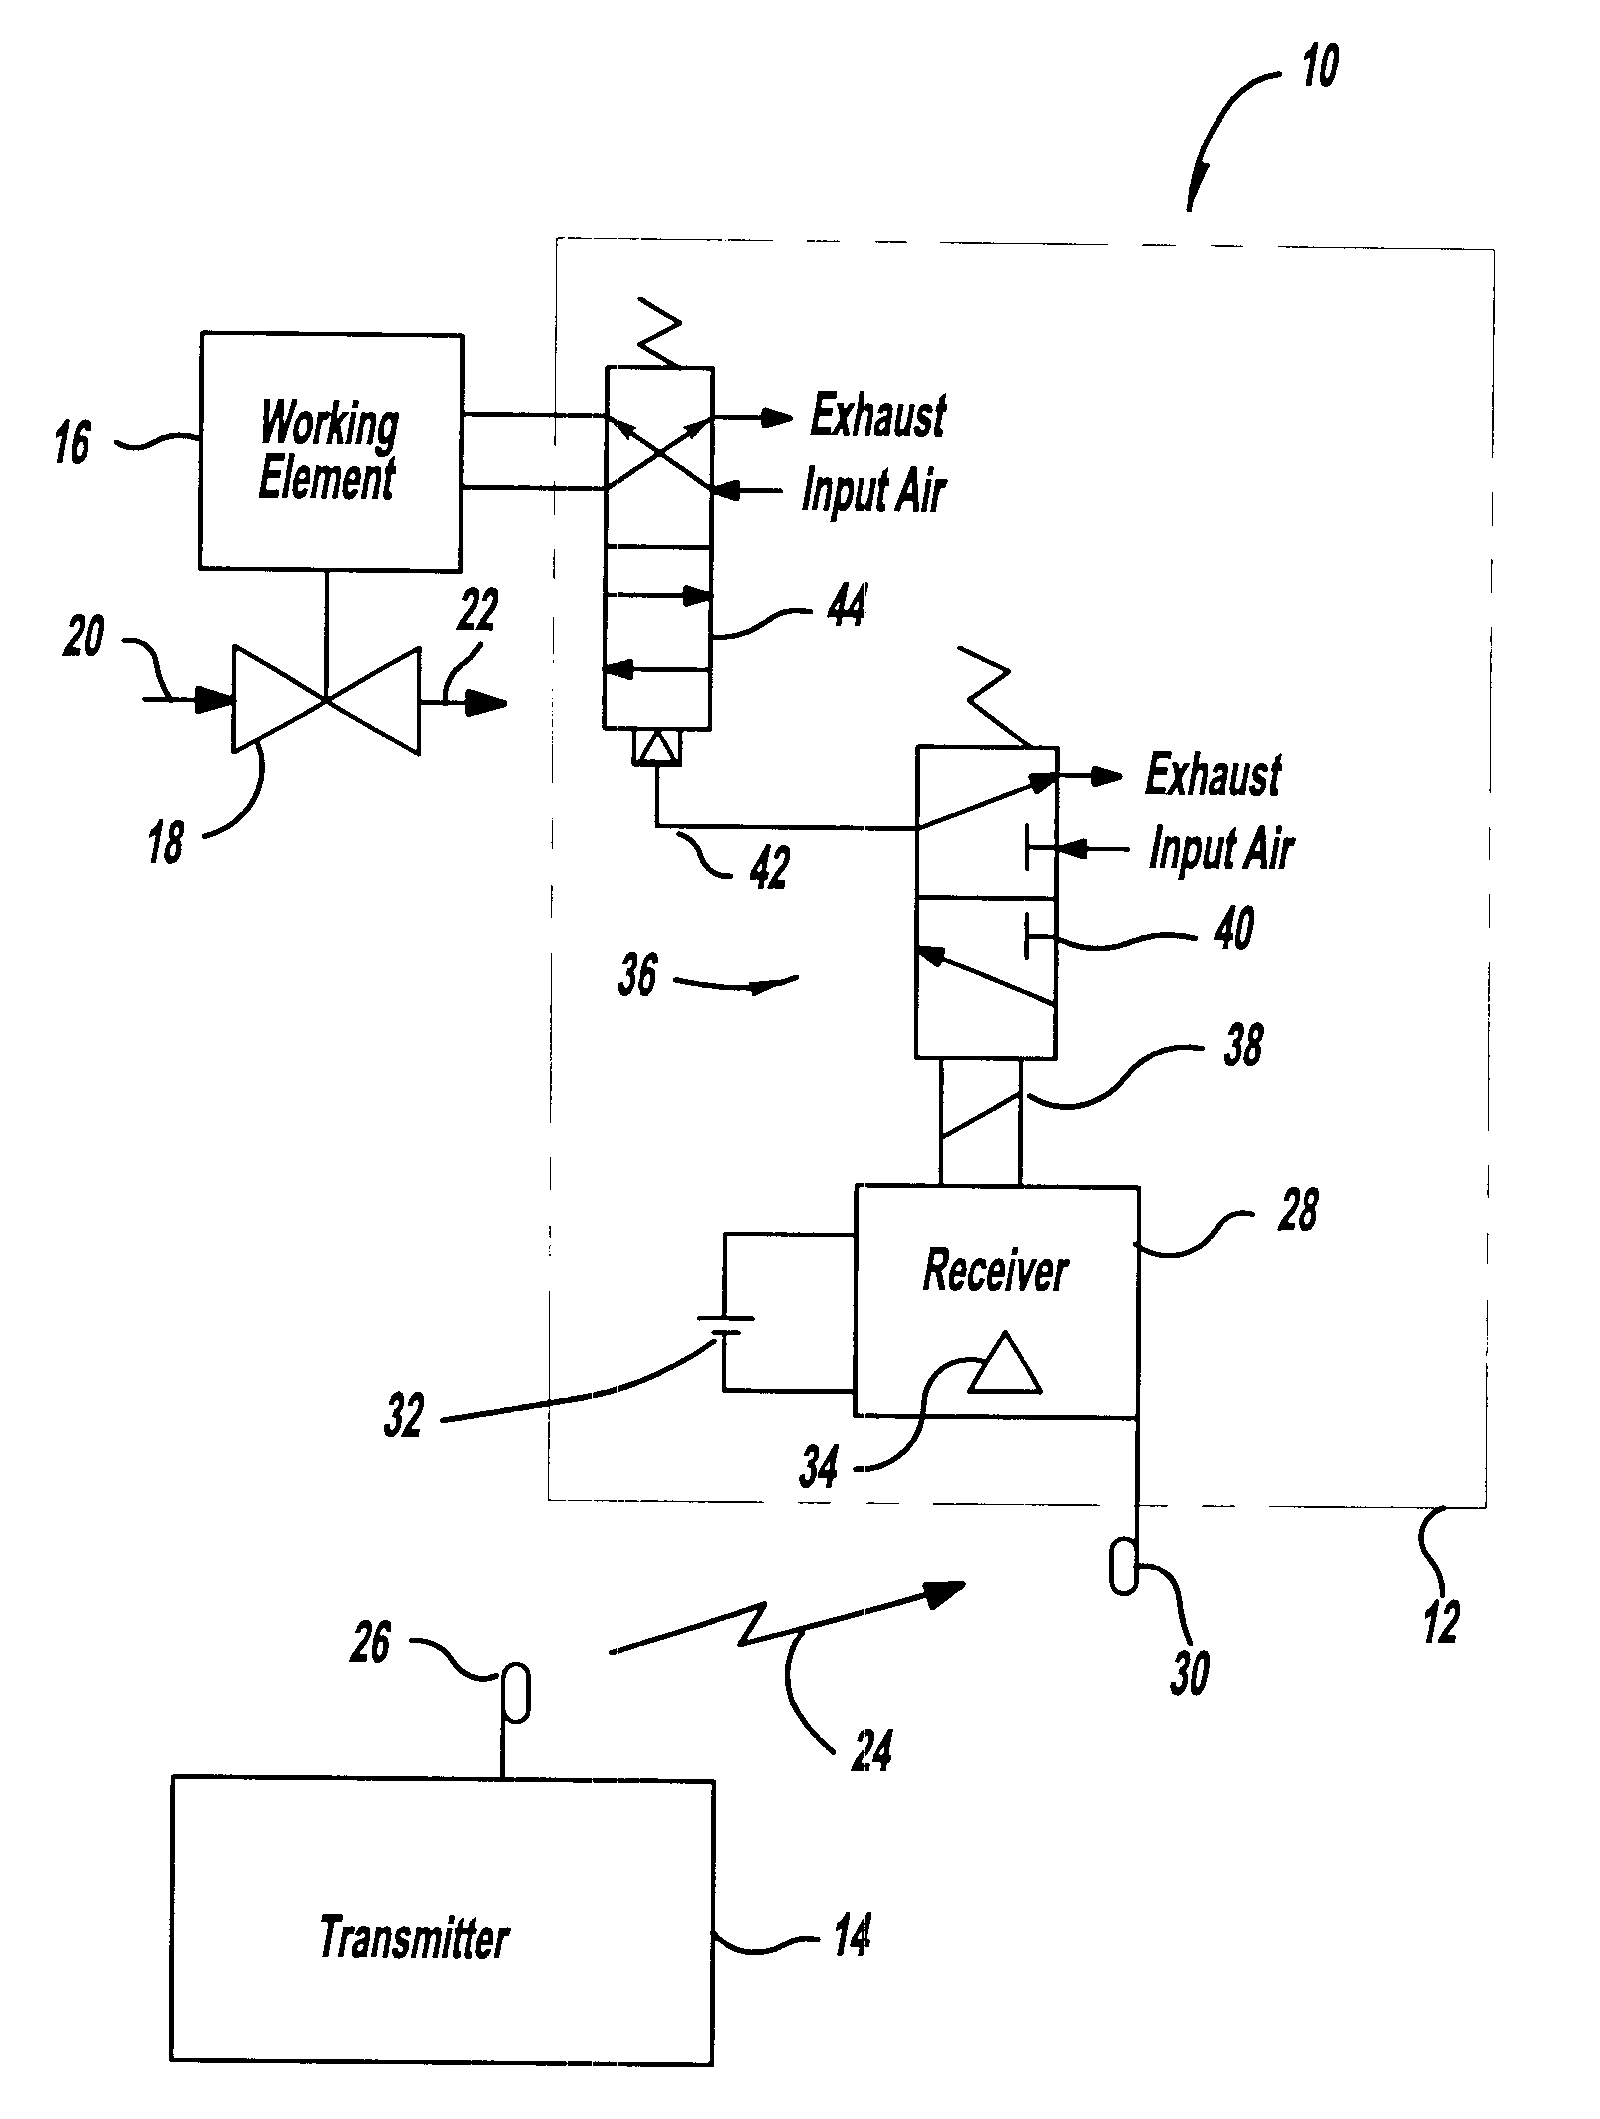 US06685159 20040203 D00000?resize=665%2C881&ssl=1 biffi actuator wiring diagram wiring diagram biffi actuator wiring diagram at soozxer.org